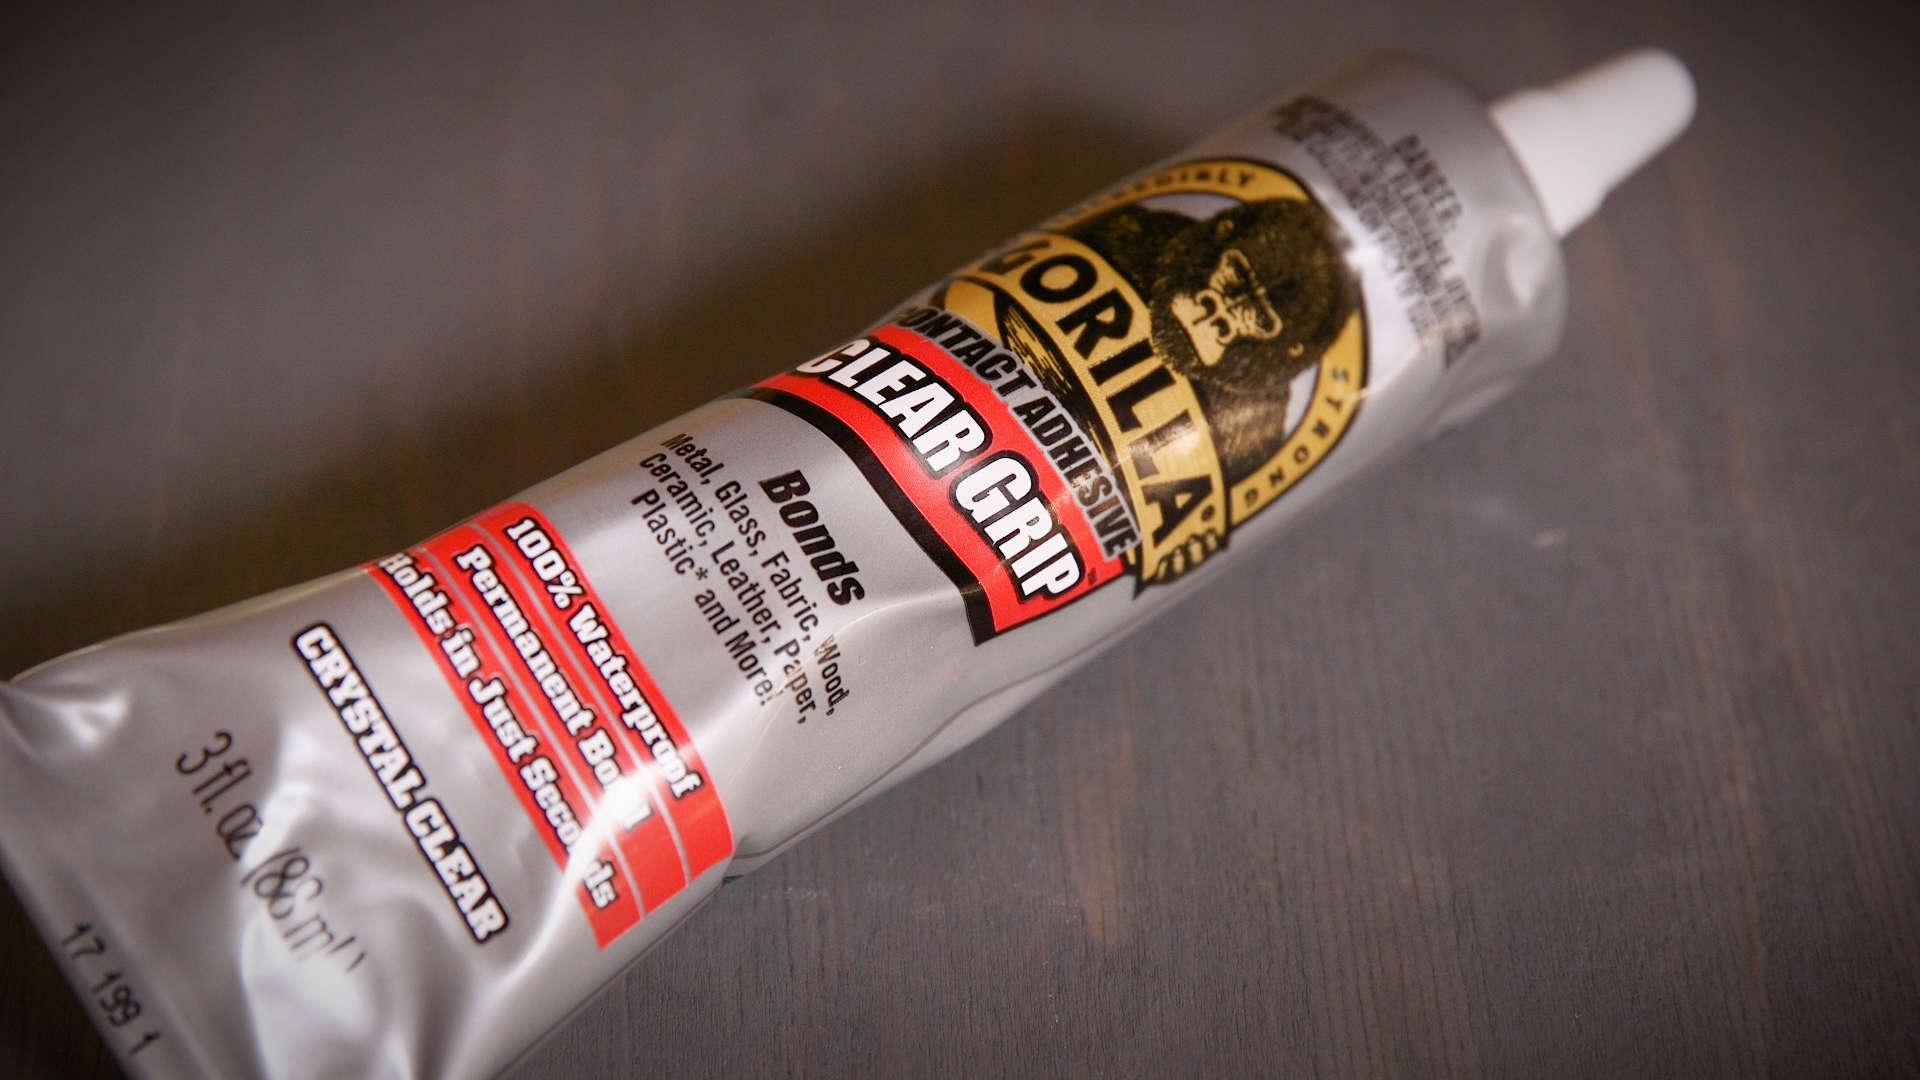 Gorilla Clear Grip® | Gorilla Glue | Gorilla Glue